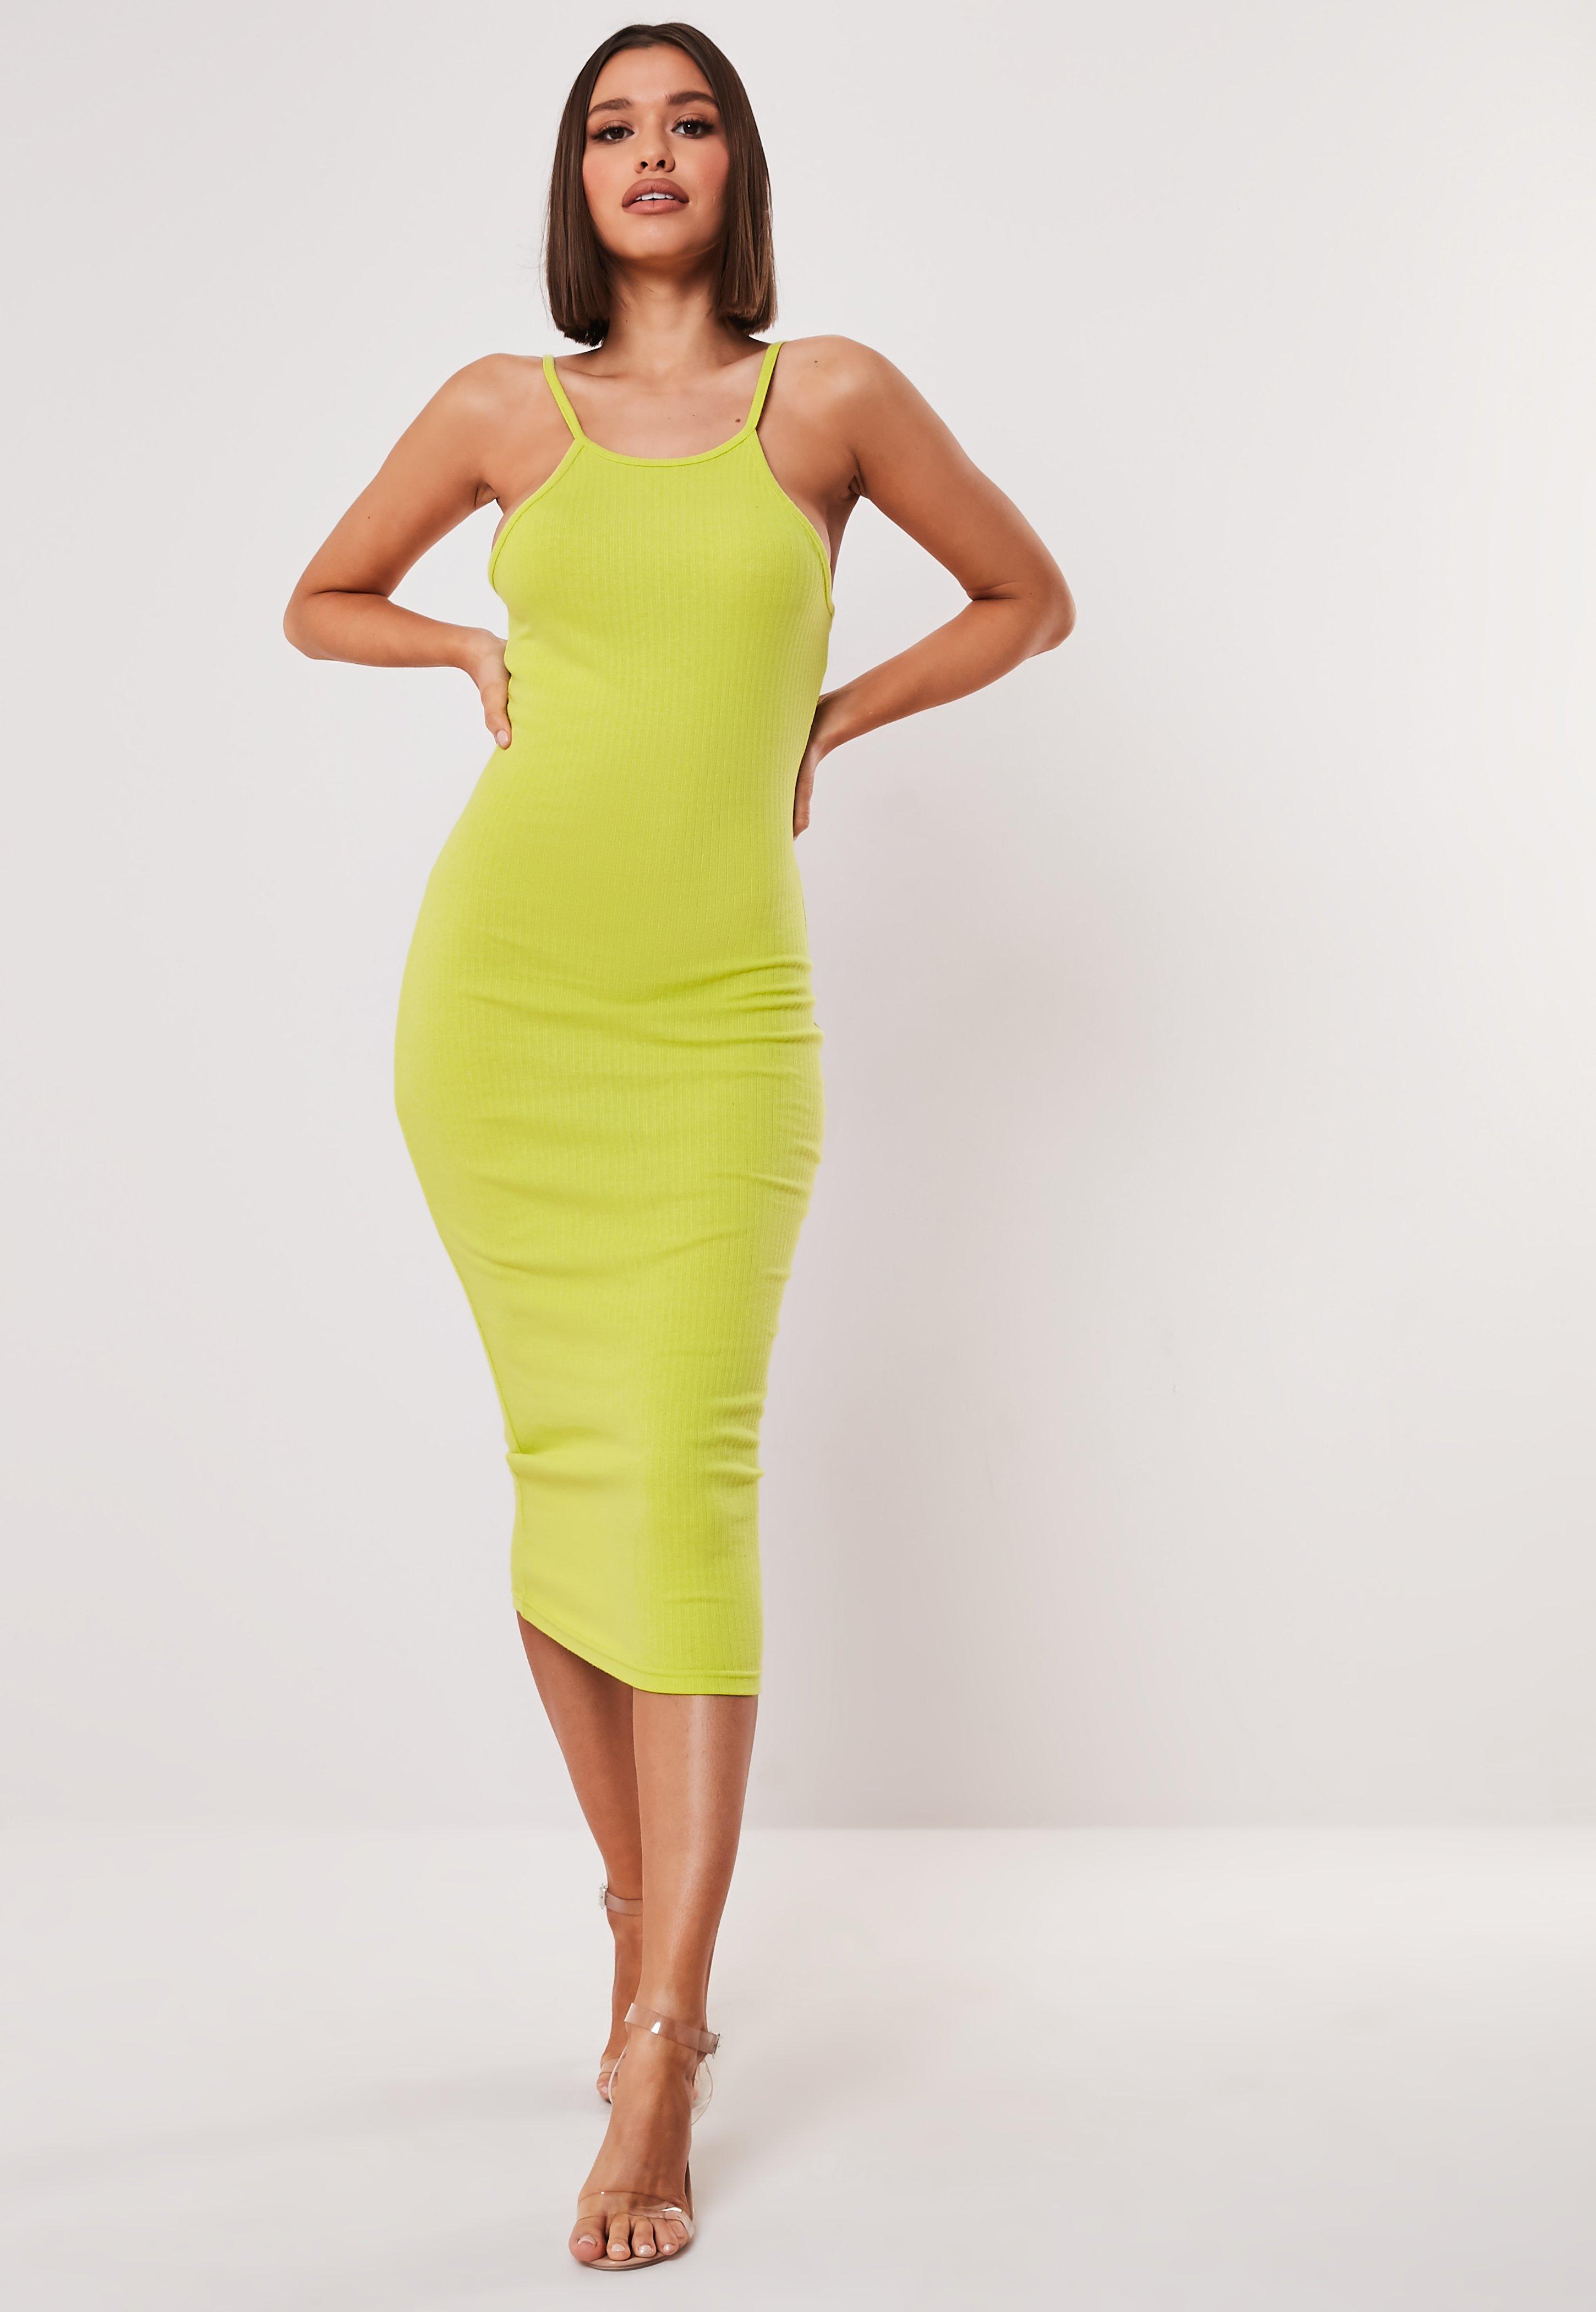 70107bdfaea7 Green Bodycon Dresses   Women's Green Bodycon Dresses Online - Missguided